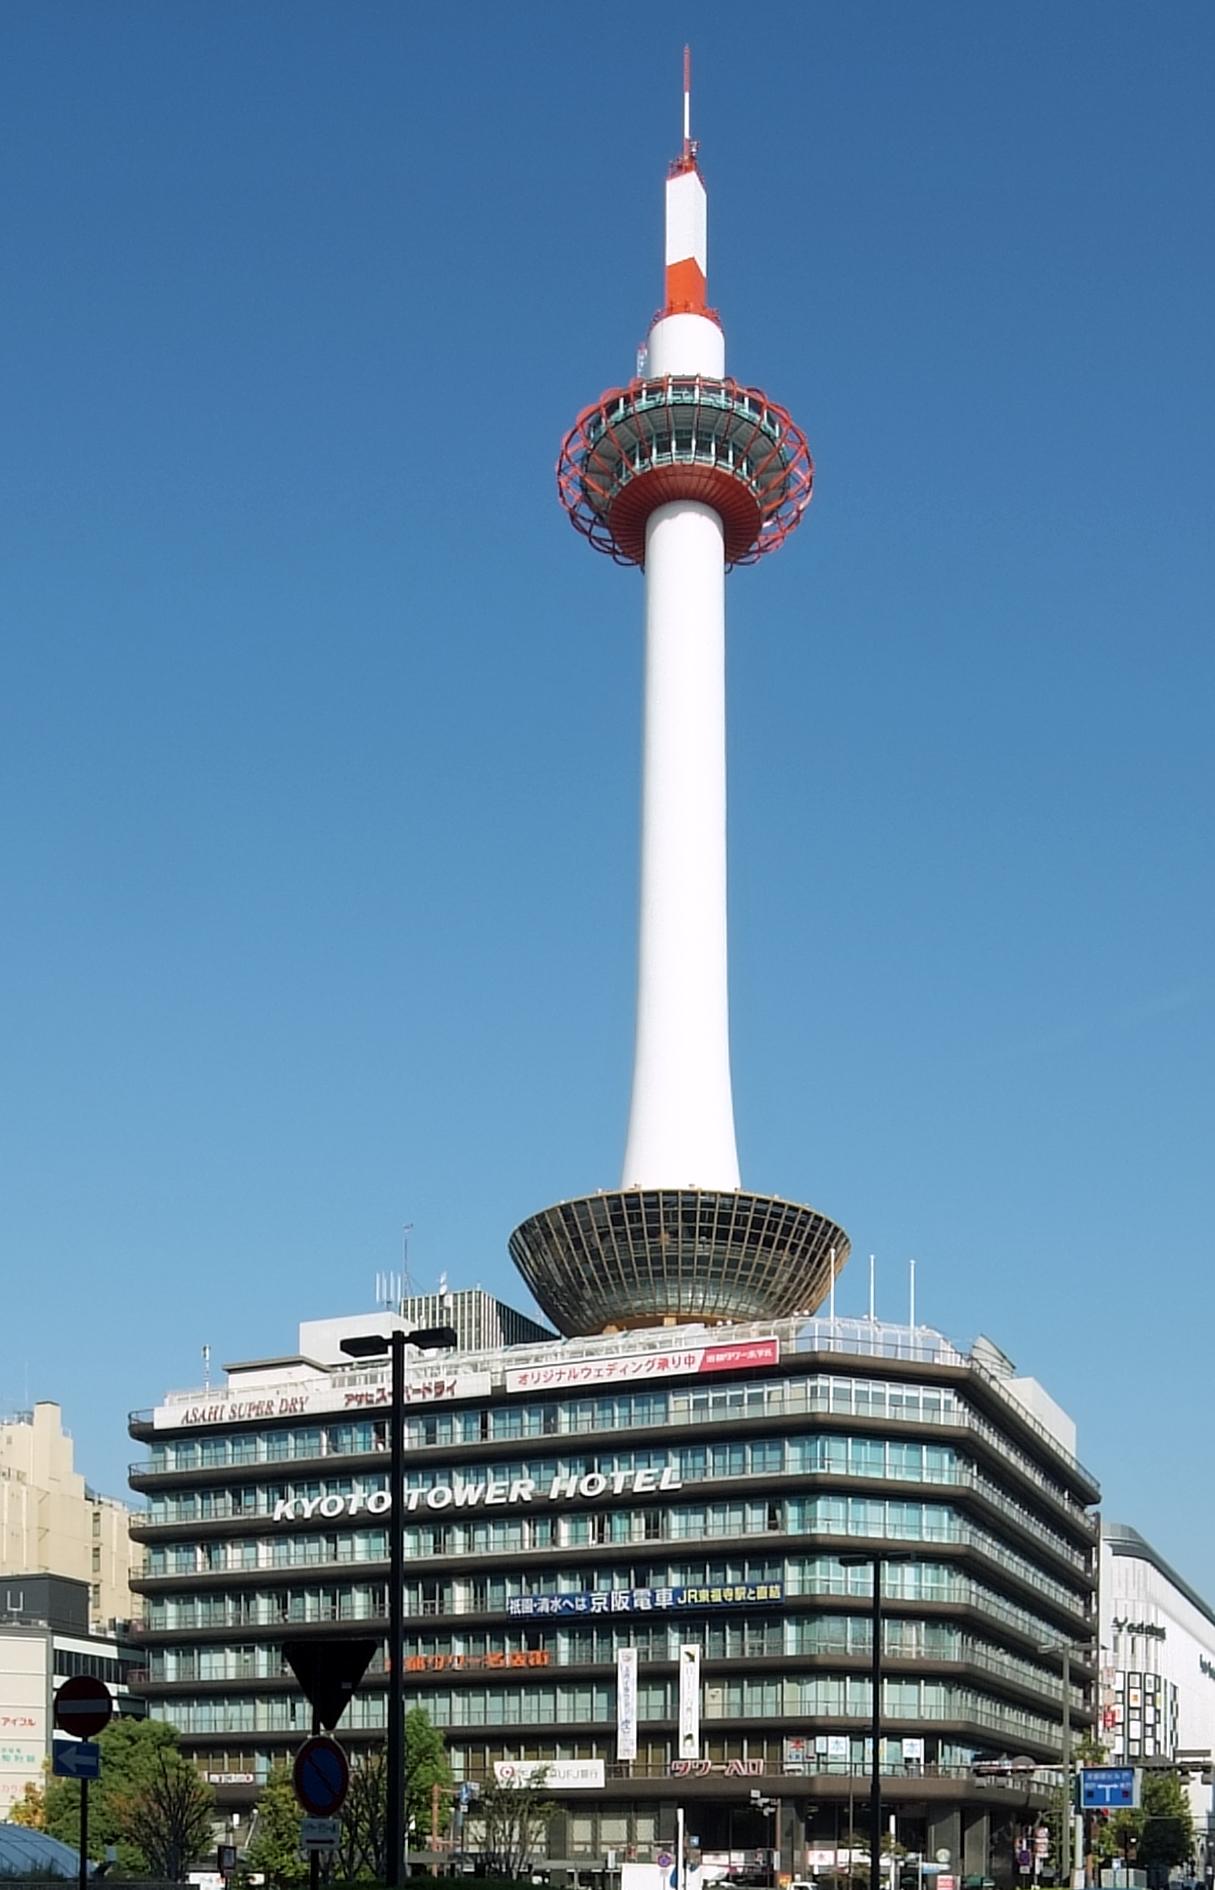 http://upload.wikimedia.org/wikipedia/commons/7/72/Kyoto_Tower_201011.jpg